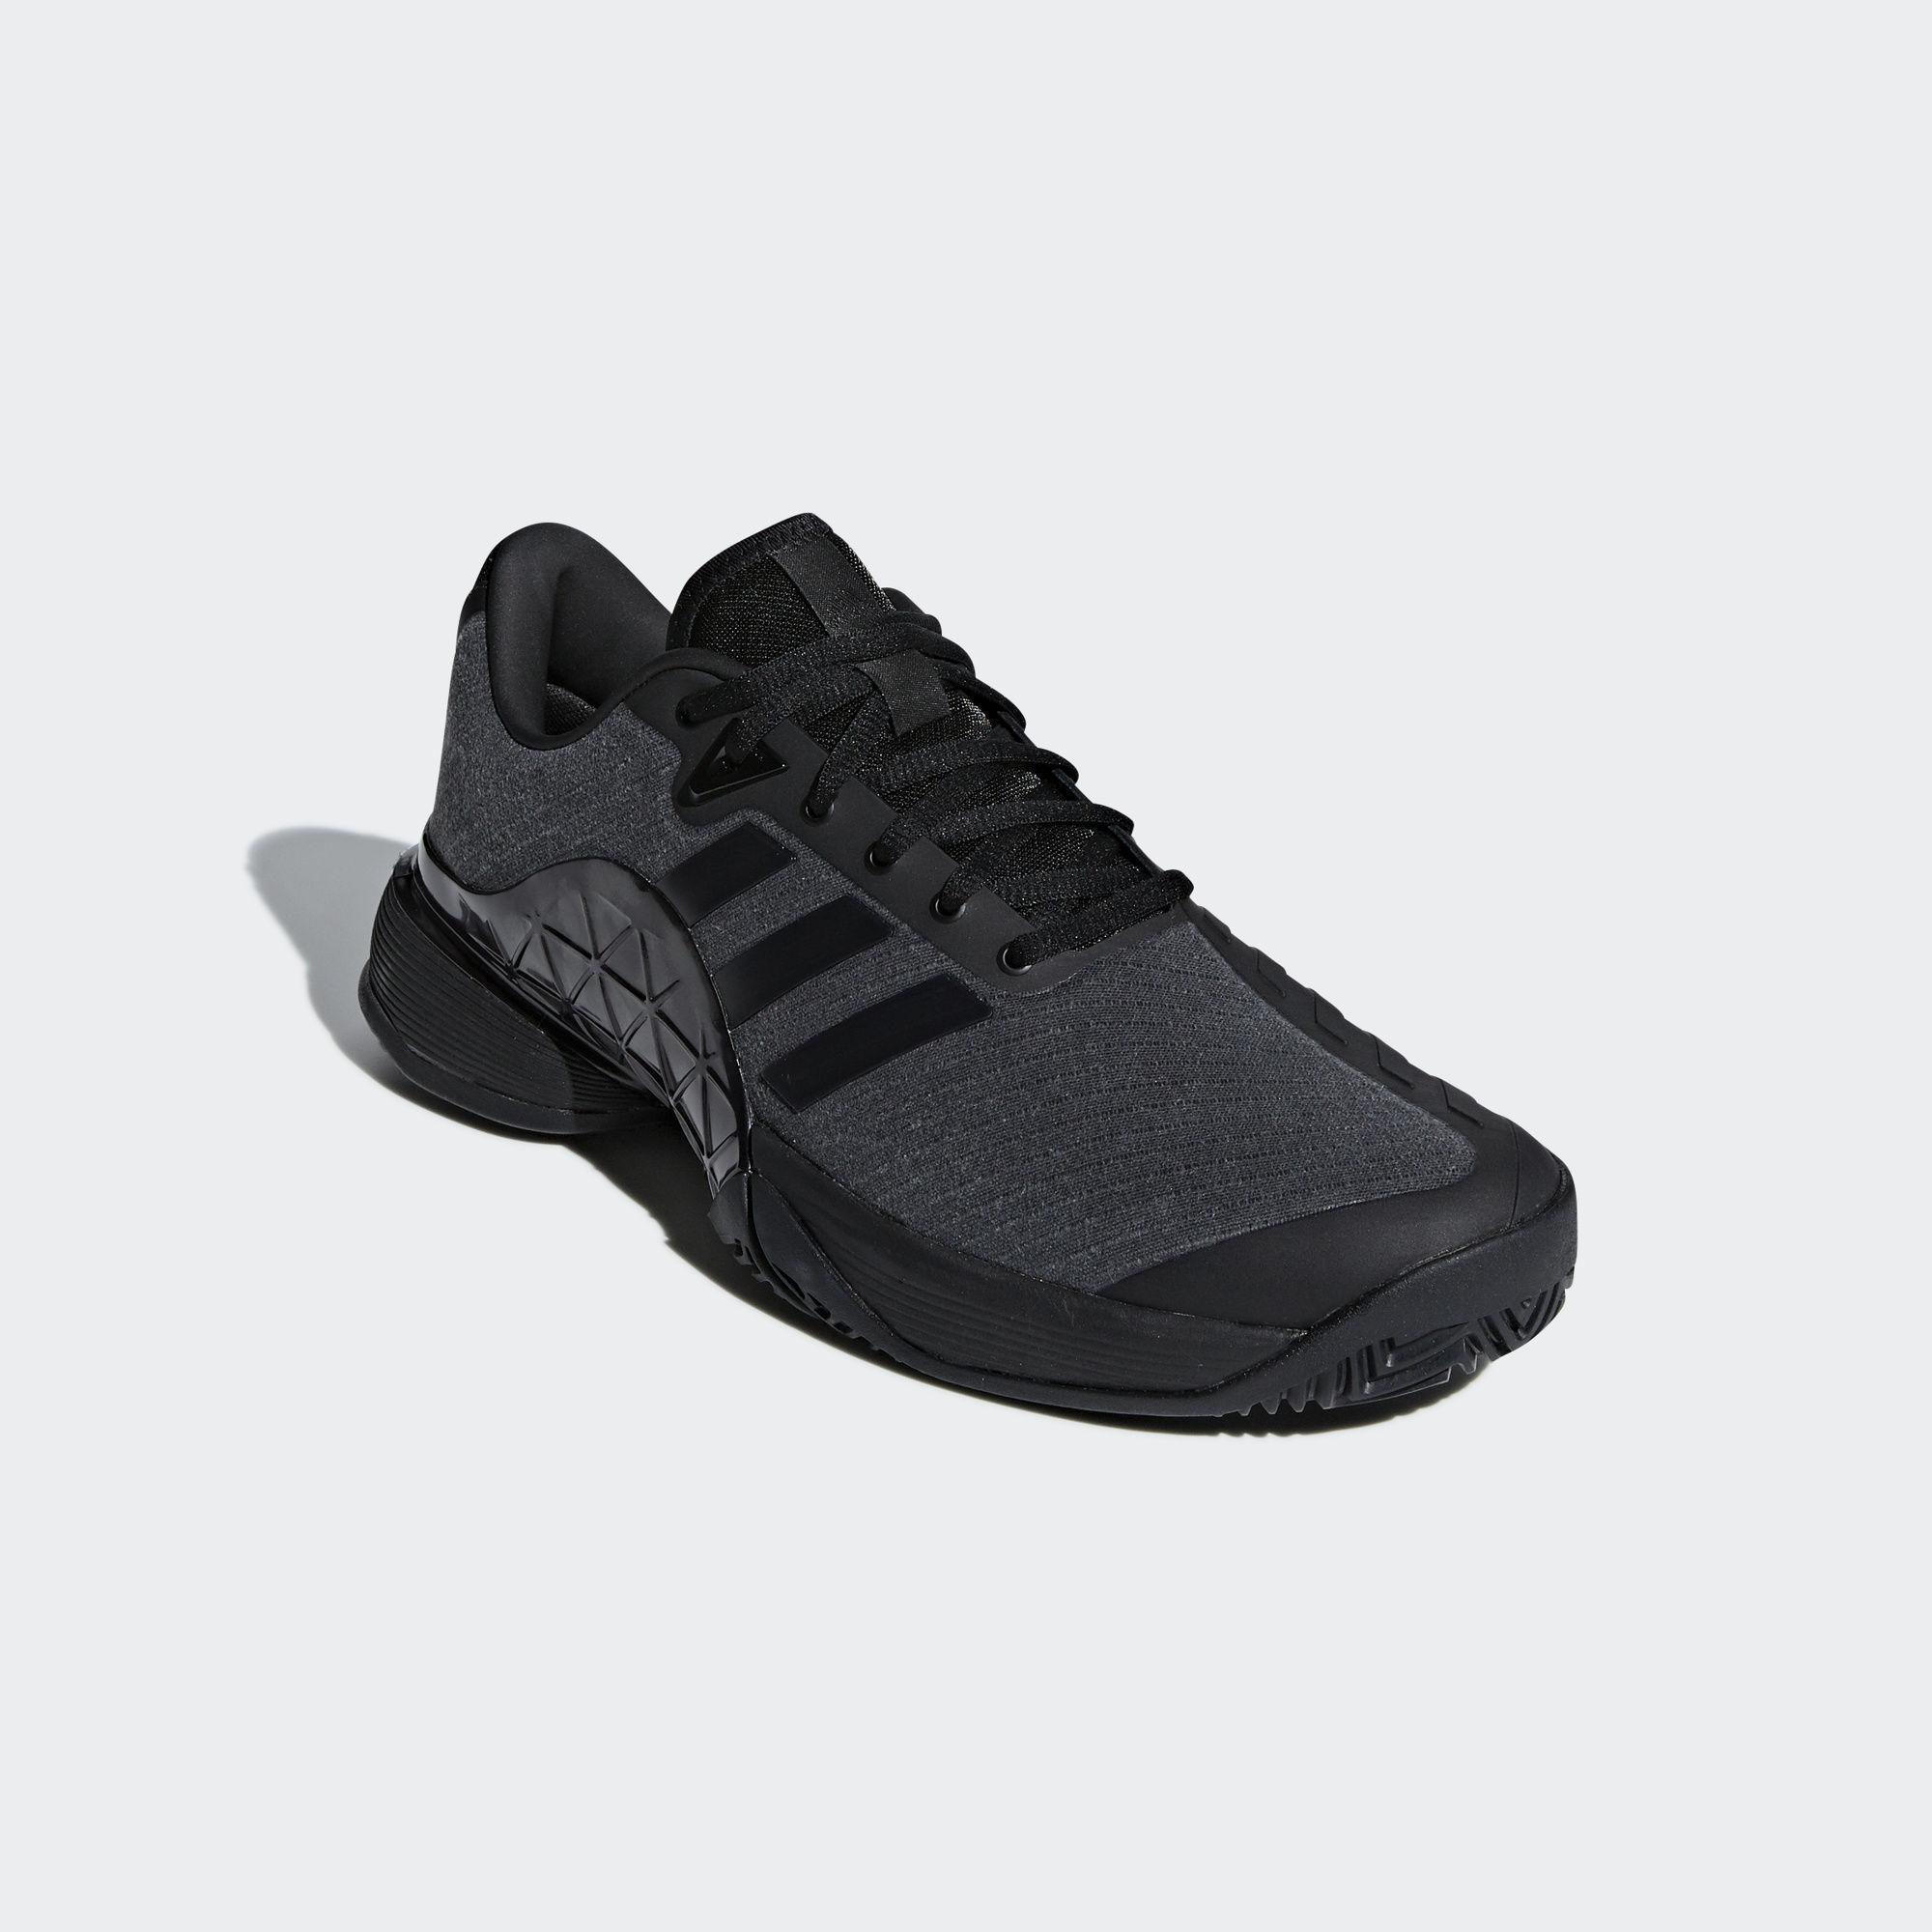 Adidas Mens Barricade 2018 LTD Edition Tennis Shoes ...